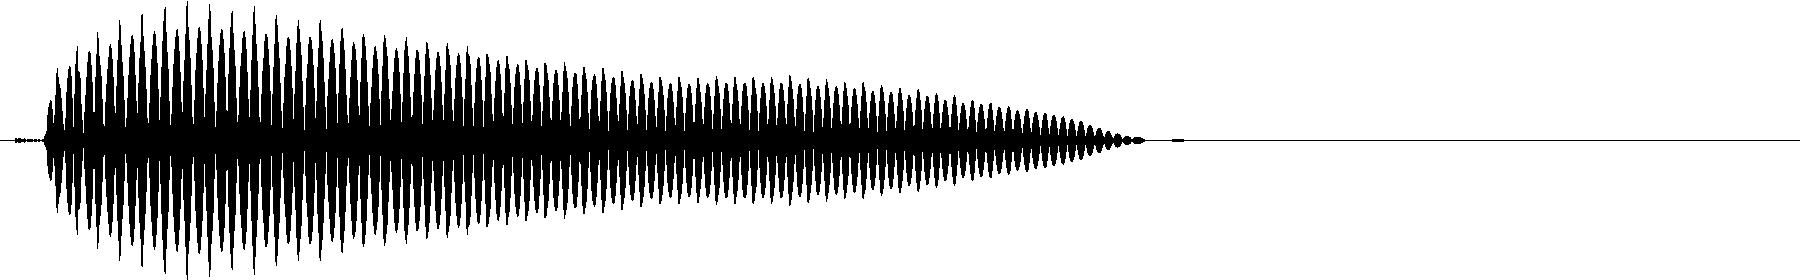 alvinspk71